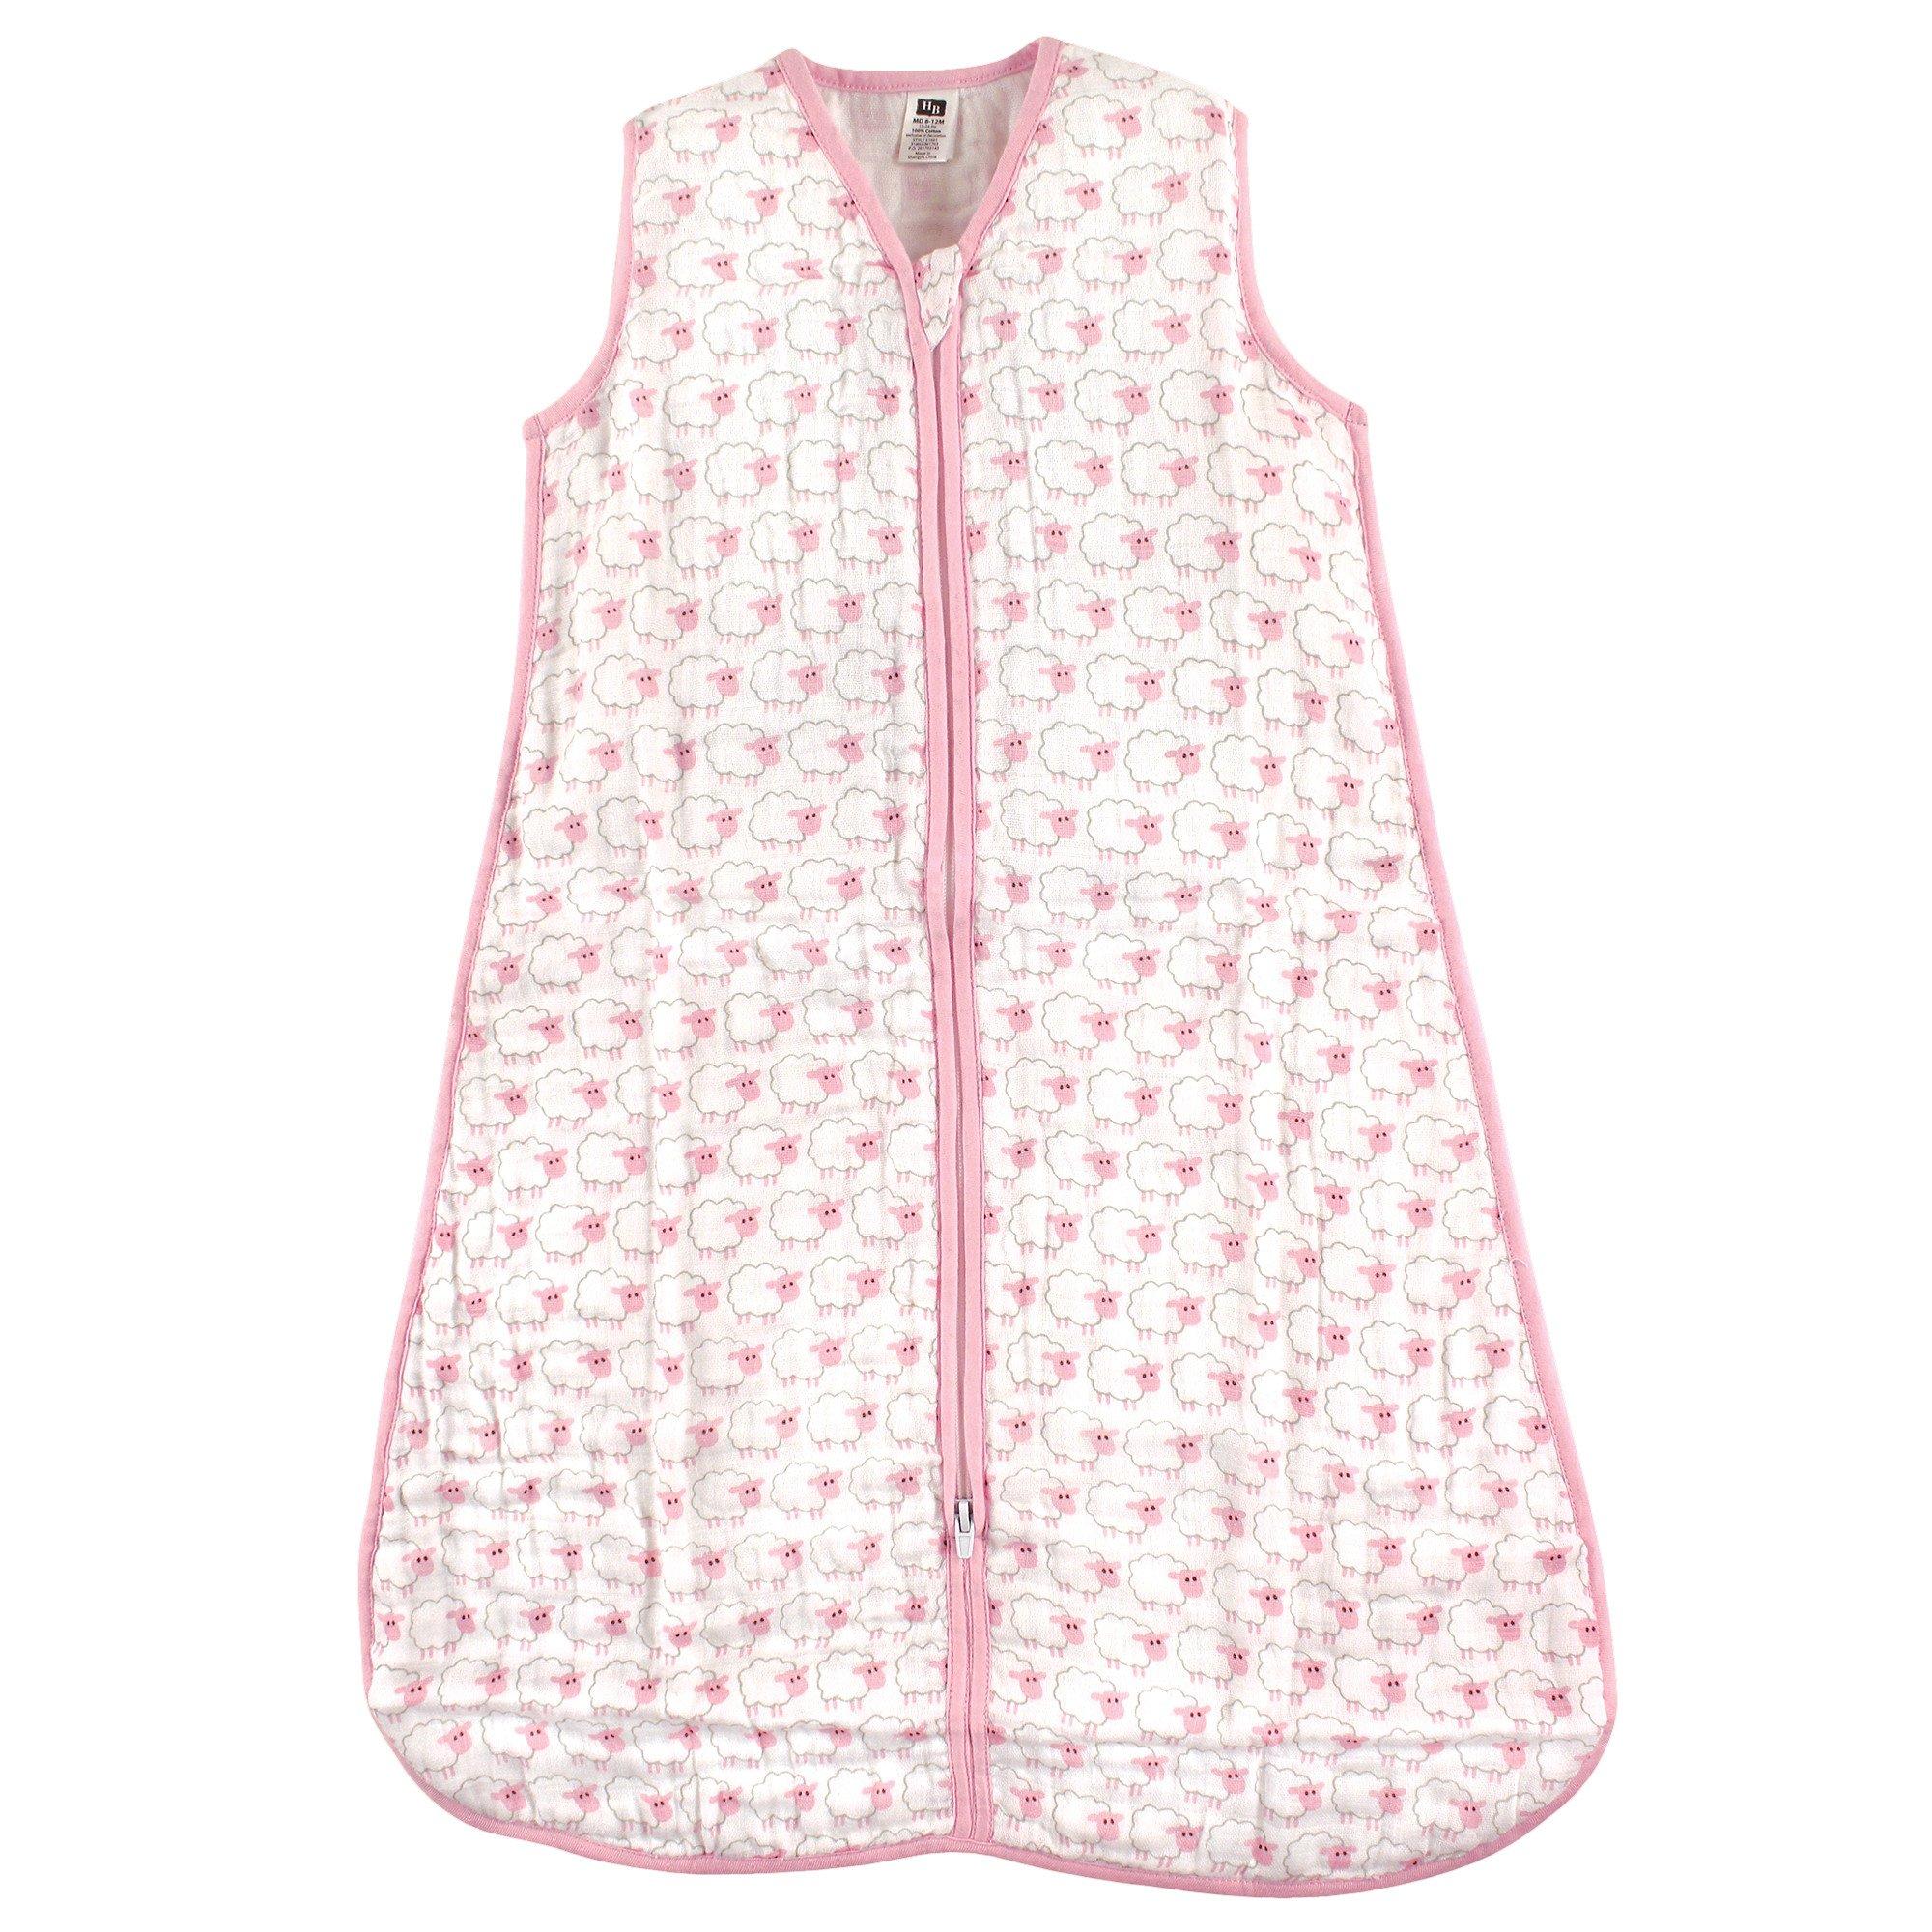 Blue Anchors Hudson Baby Wearable Safe Sleep Muslin Sleeping Bag 0-6 Months